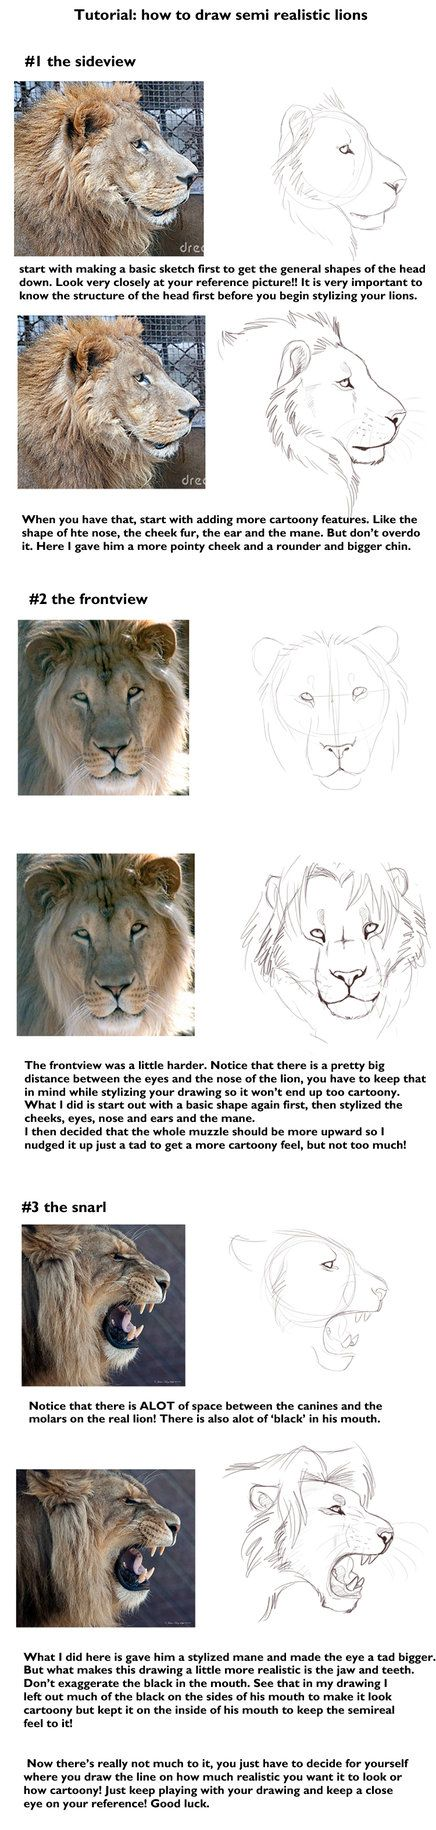 Semi realistic lion head tut by TorazTheNomad on deviantART